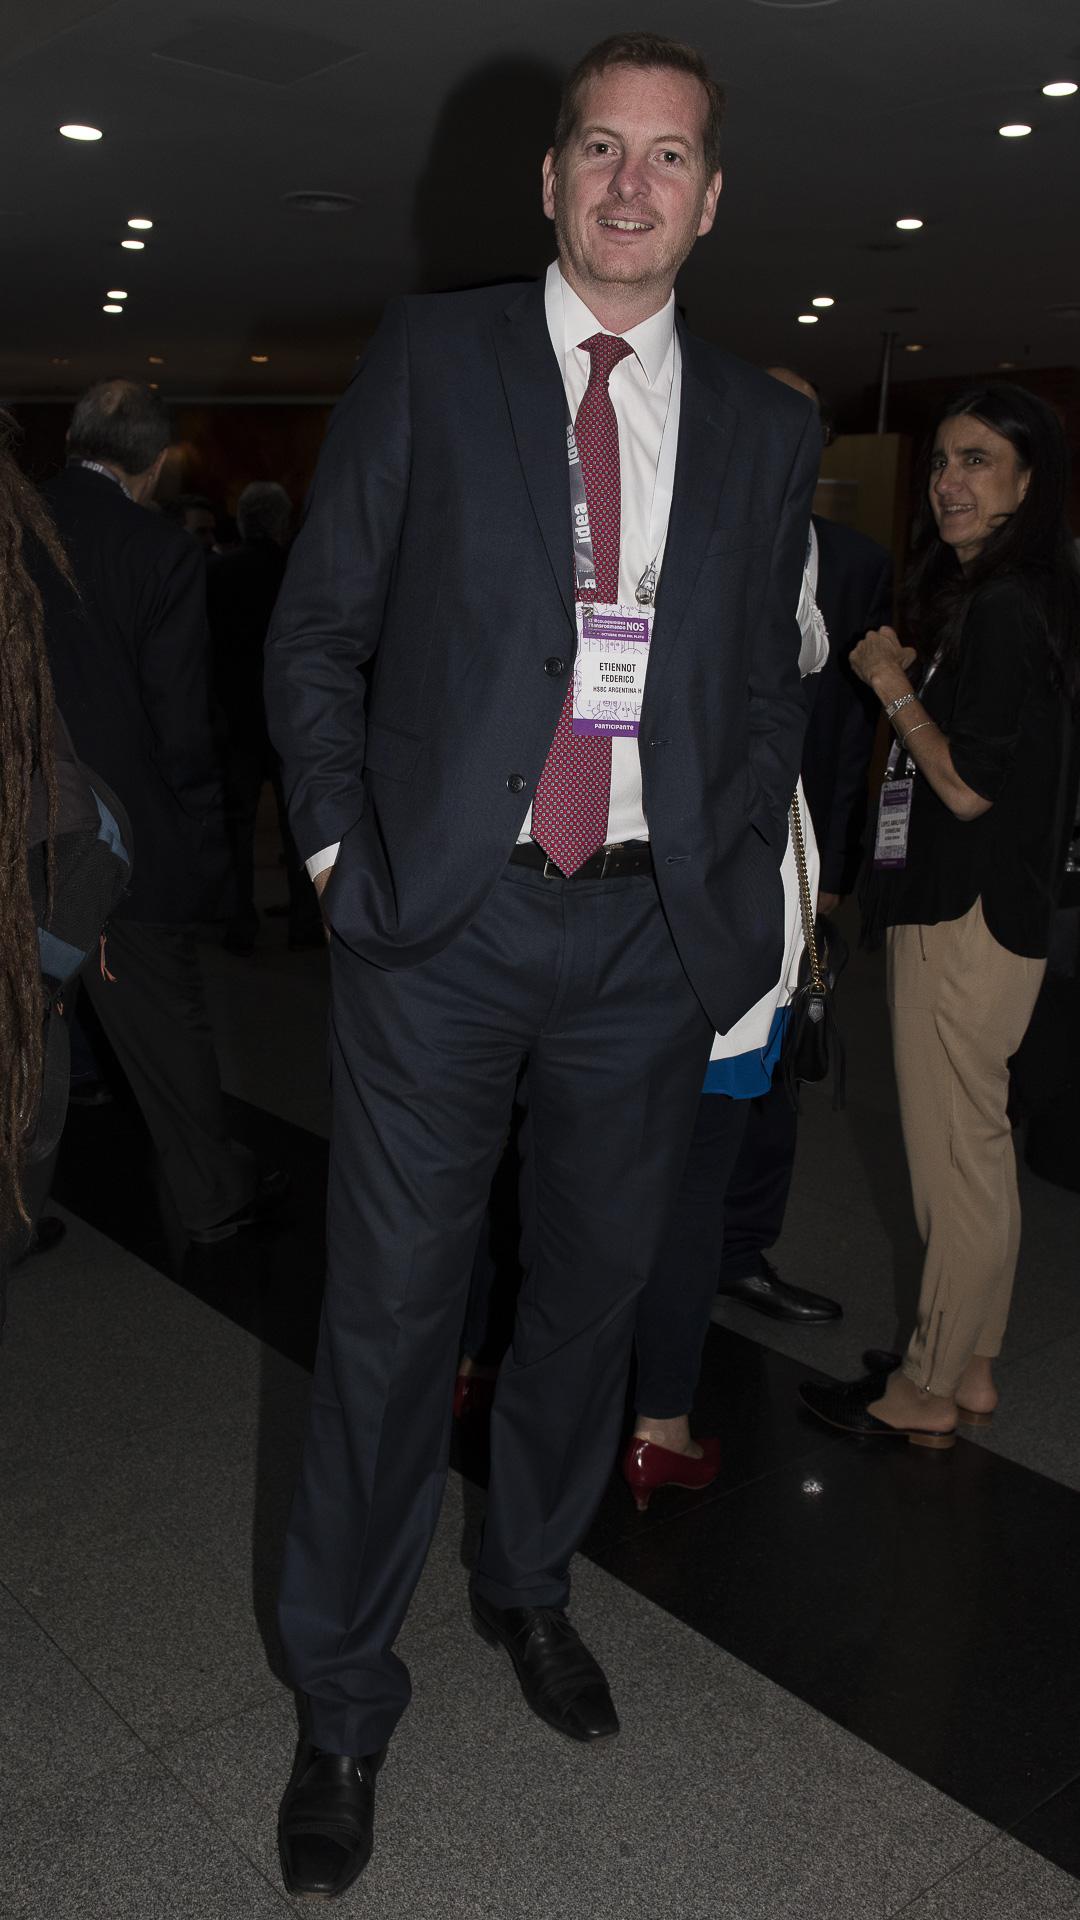 Federico Etienott, Director del HSBC